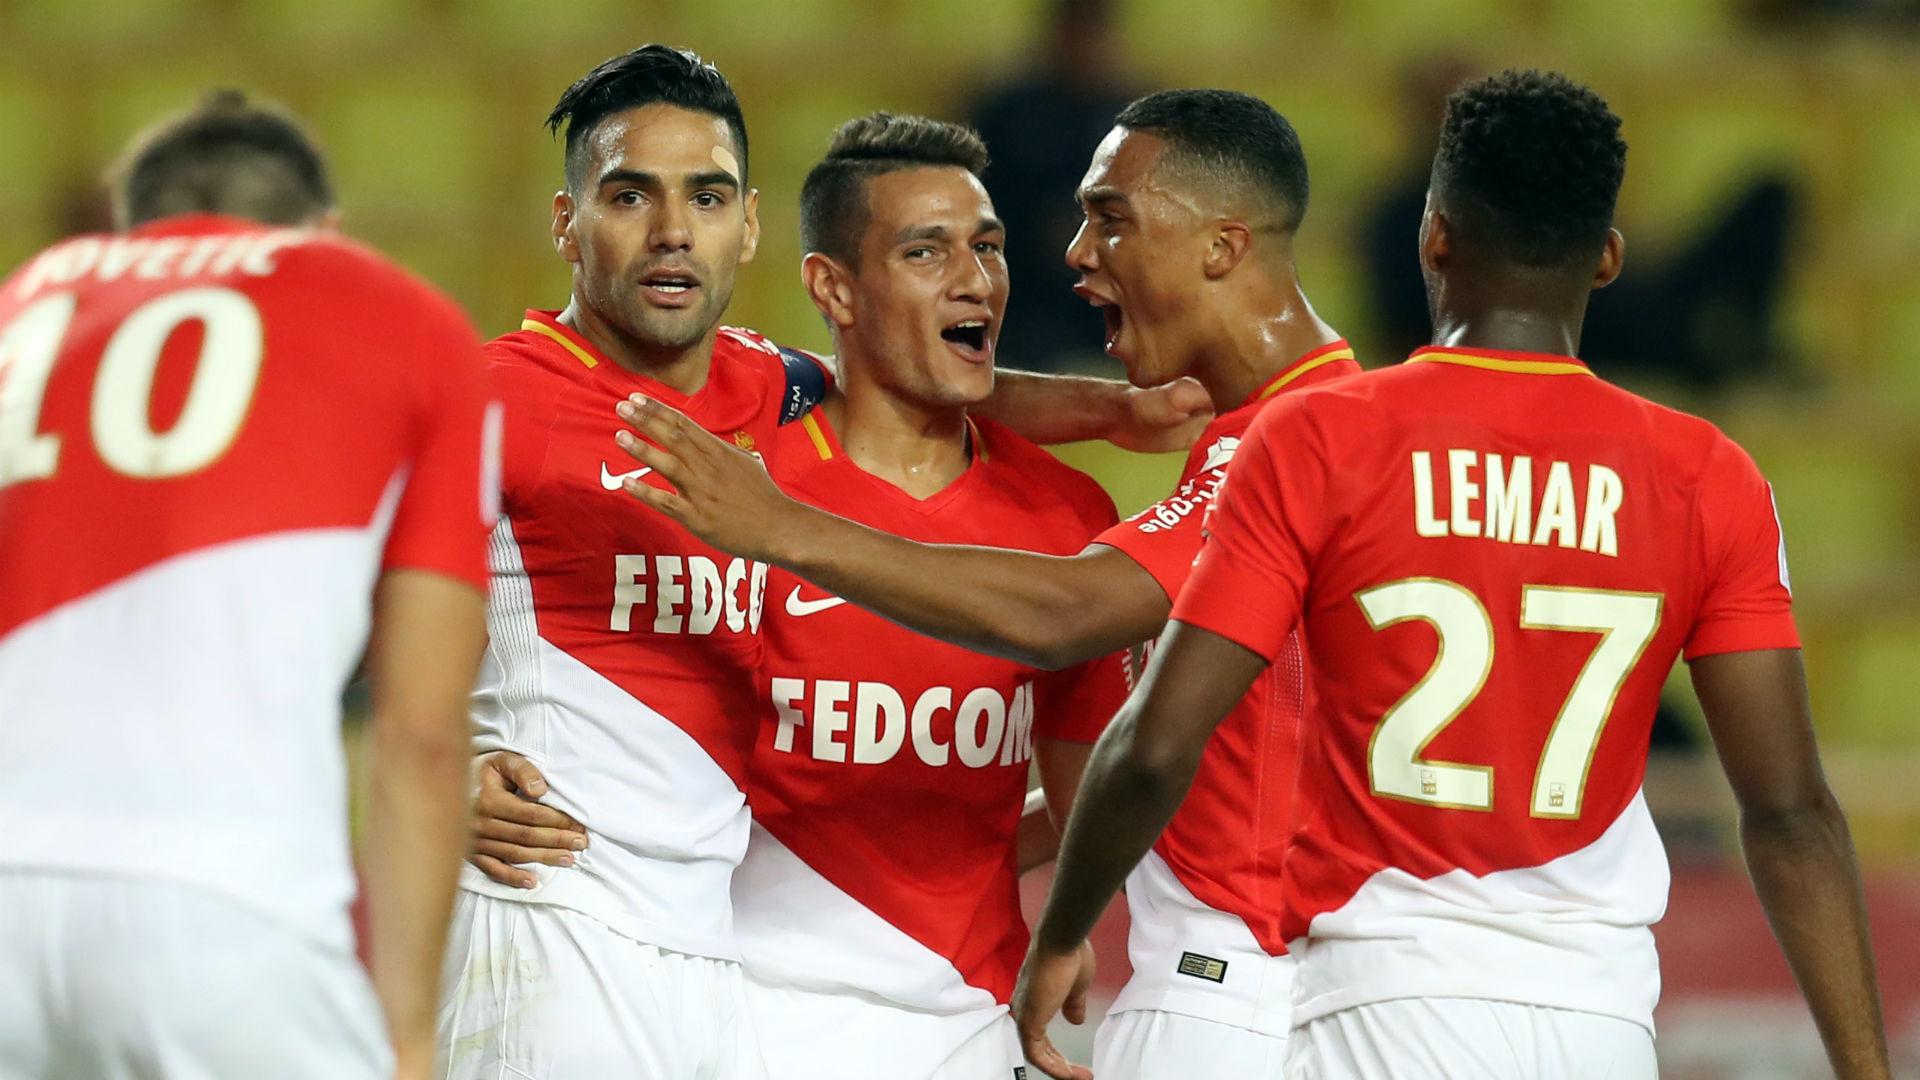 Monaco Radamel Falcao